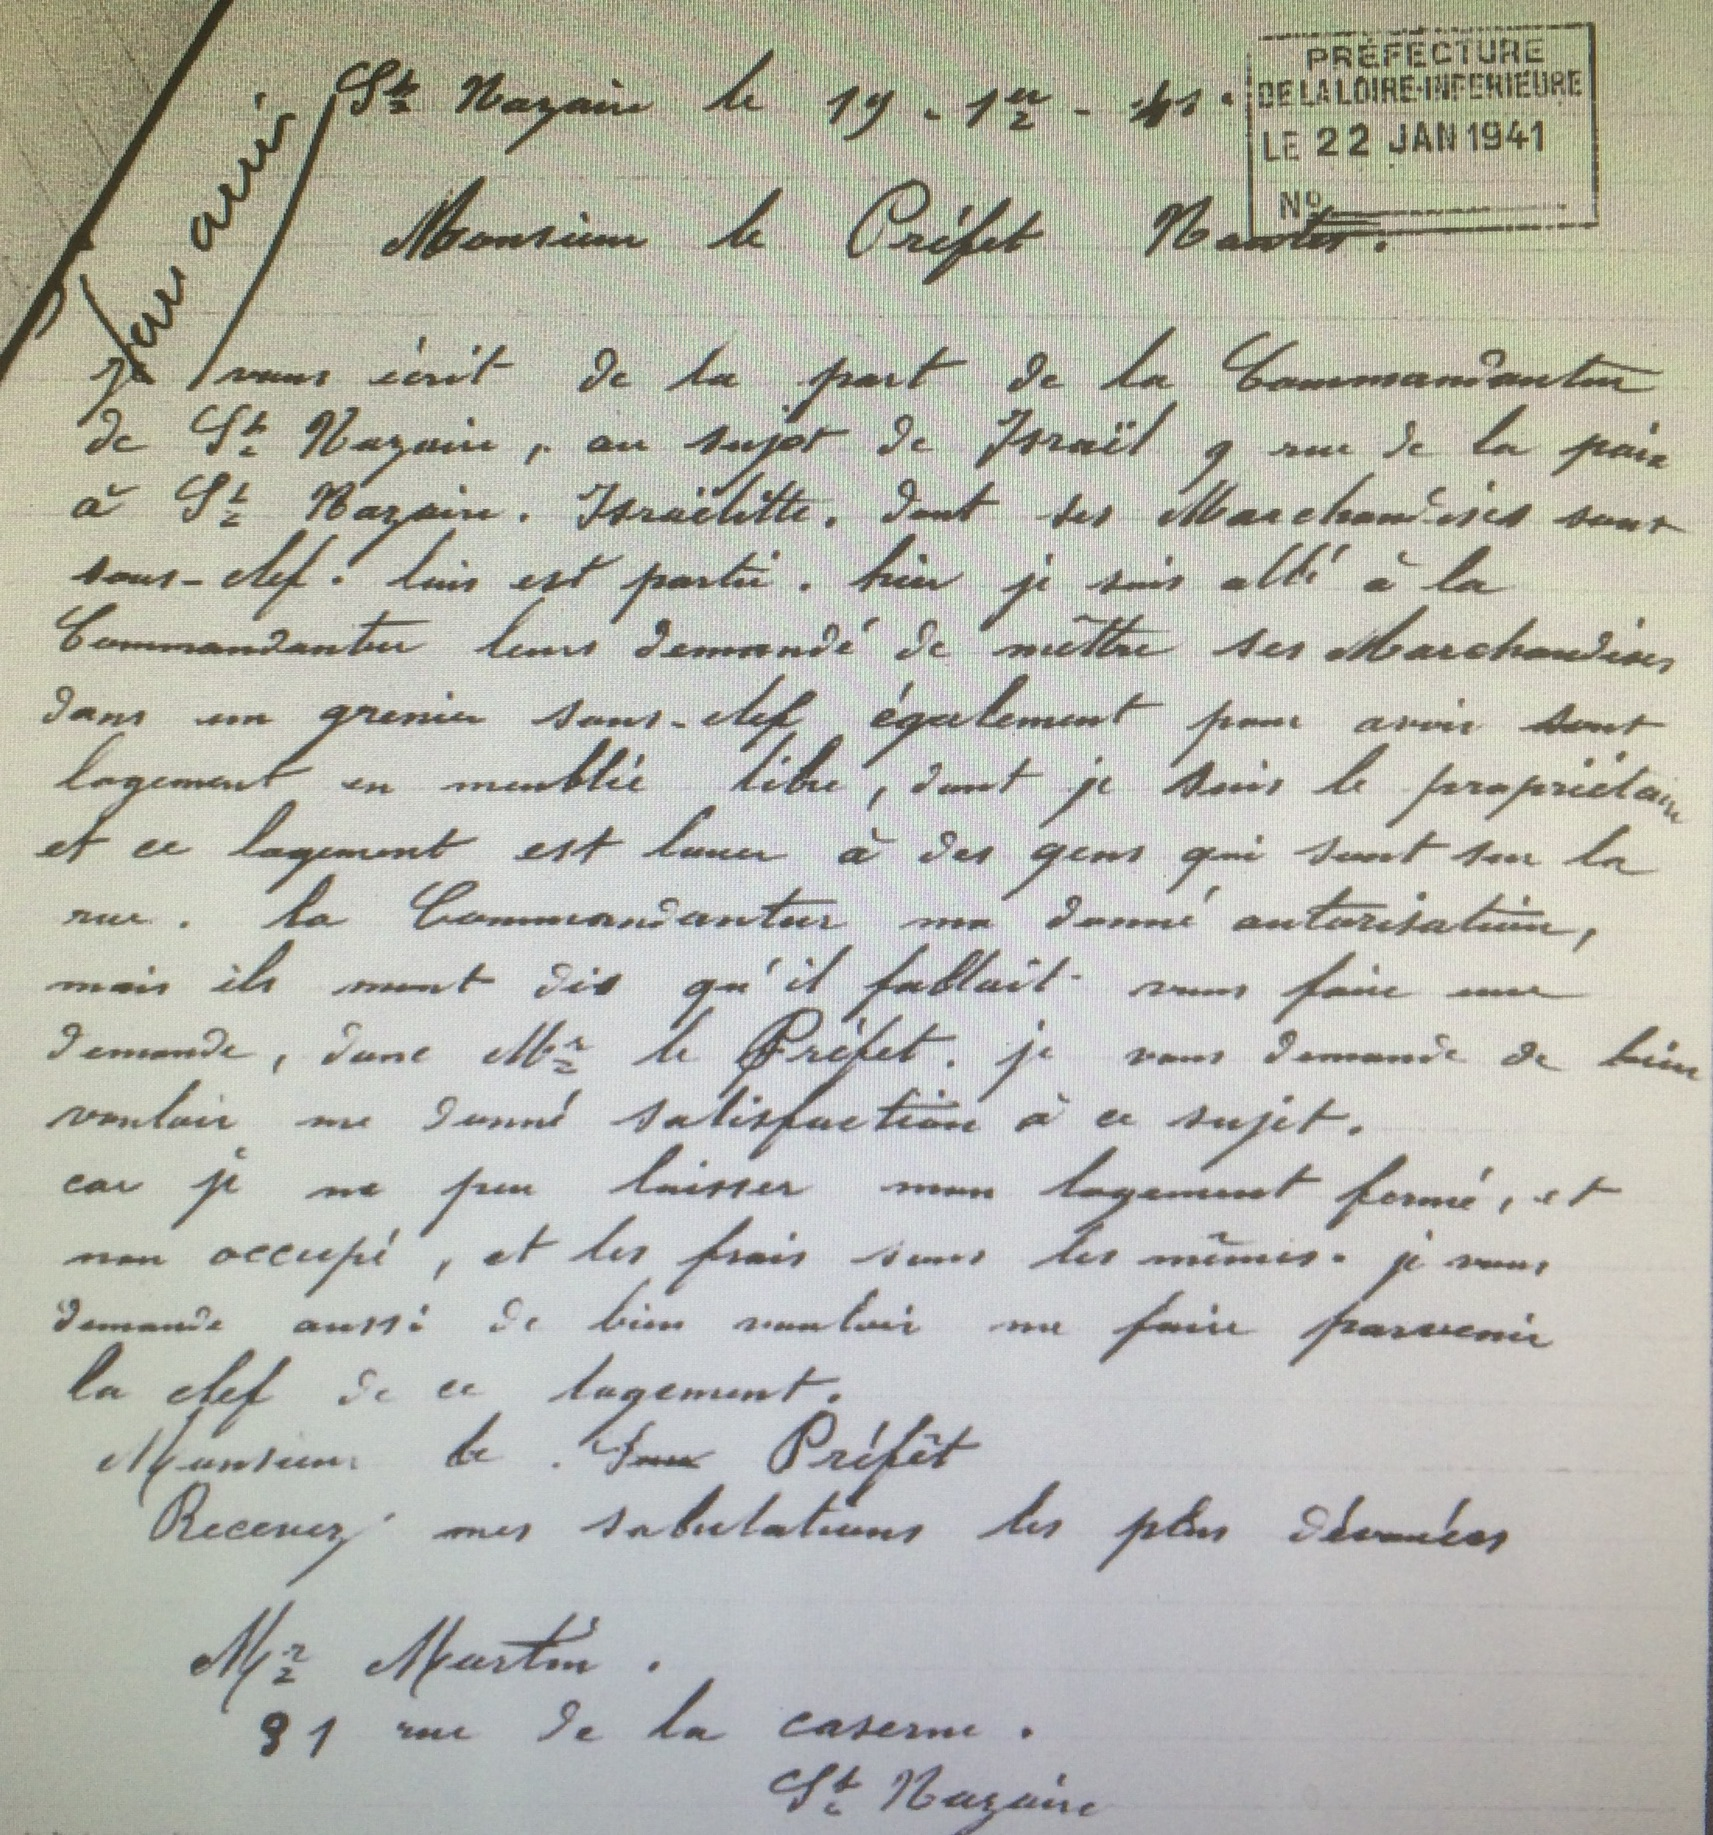 Lettre de Monsieur MARTIN 19 janvier 1941 [AN AJ38/4598 dossier n°2534]